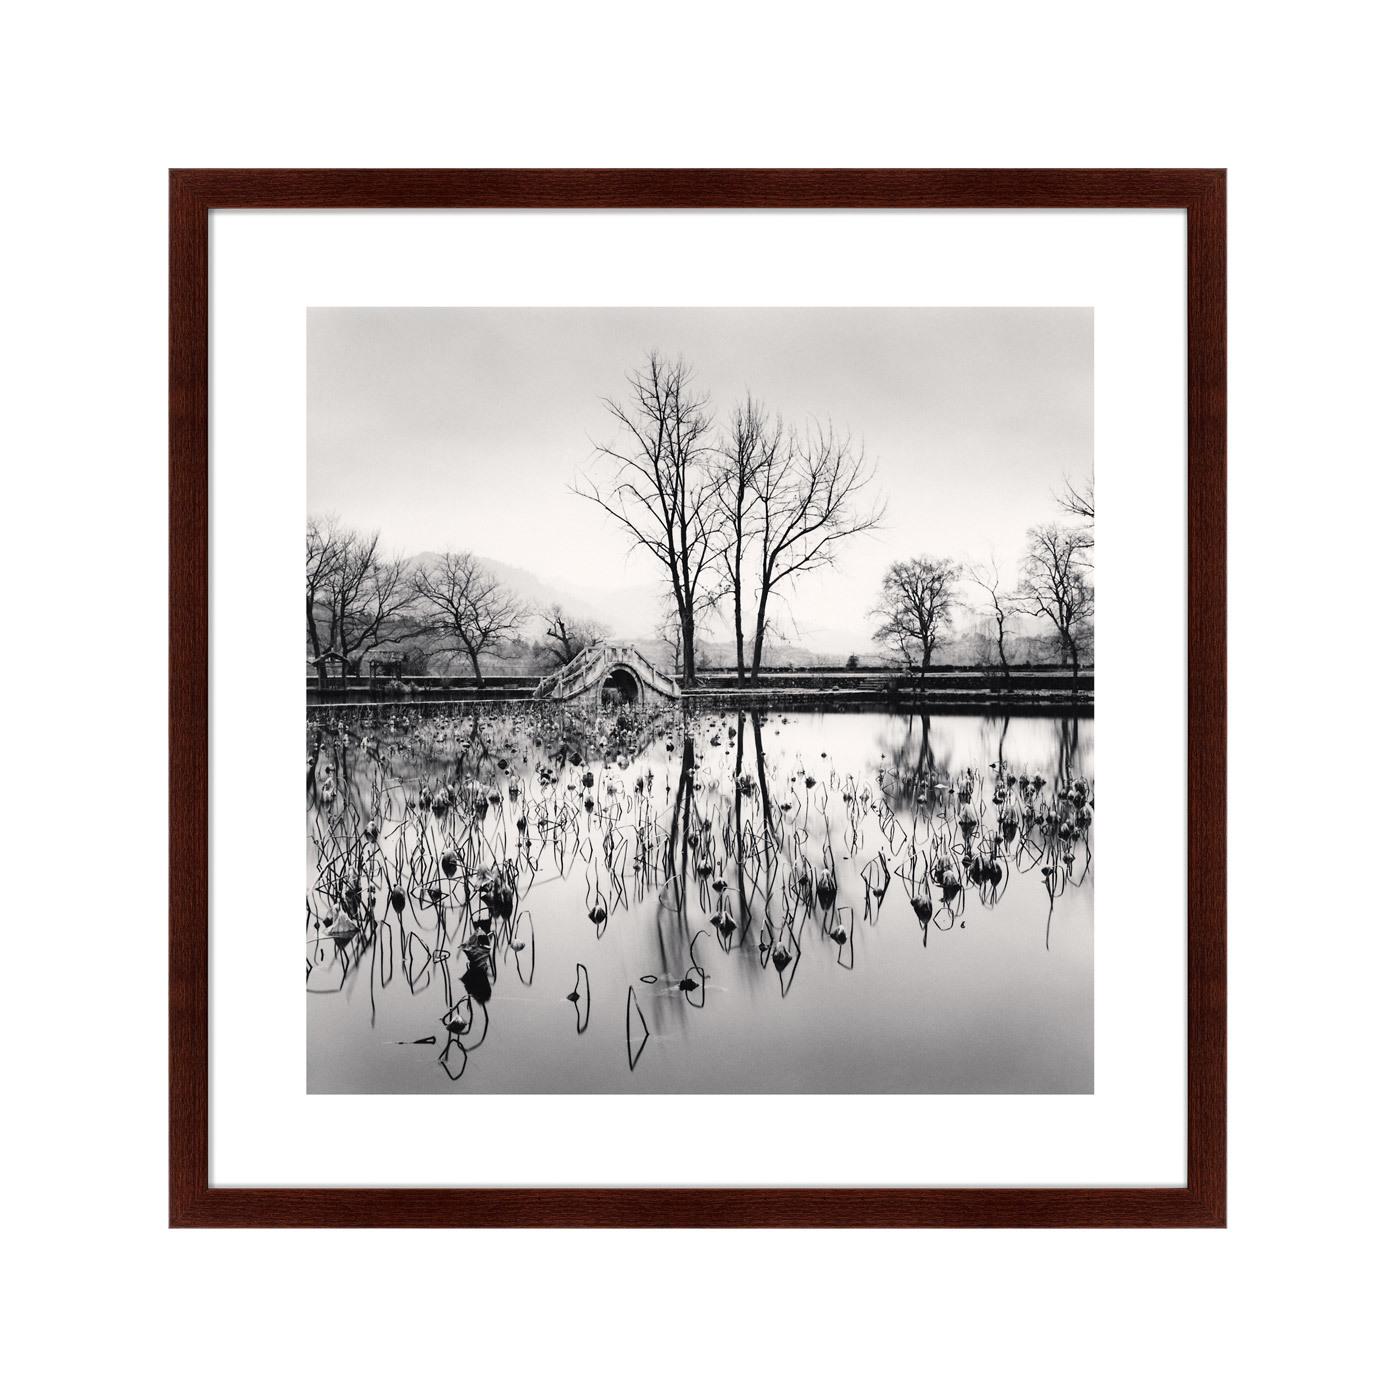 {} Картины в Квартиру Картина Lake Bridge Hongkun (79х79 см) картины в квартиру картина sun beams 79х79 см